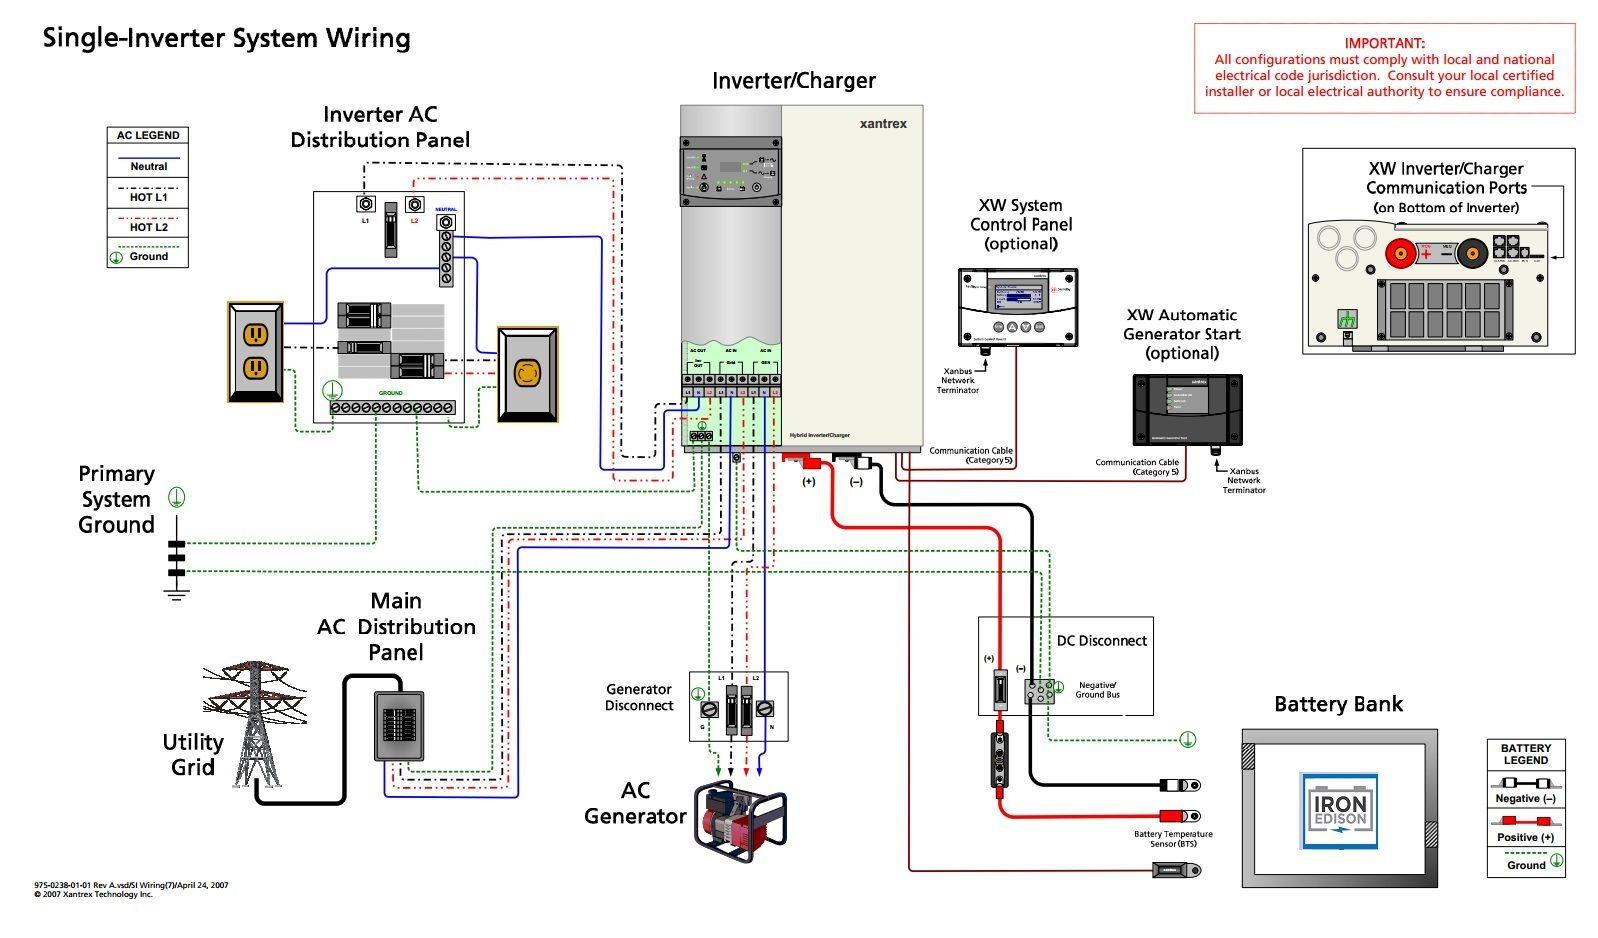 Complete System Wiring Diagram Jpg 1 598 U00d7938 Pixels